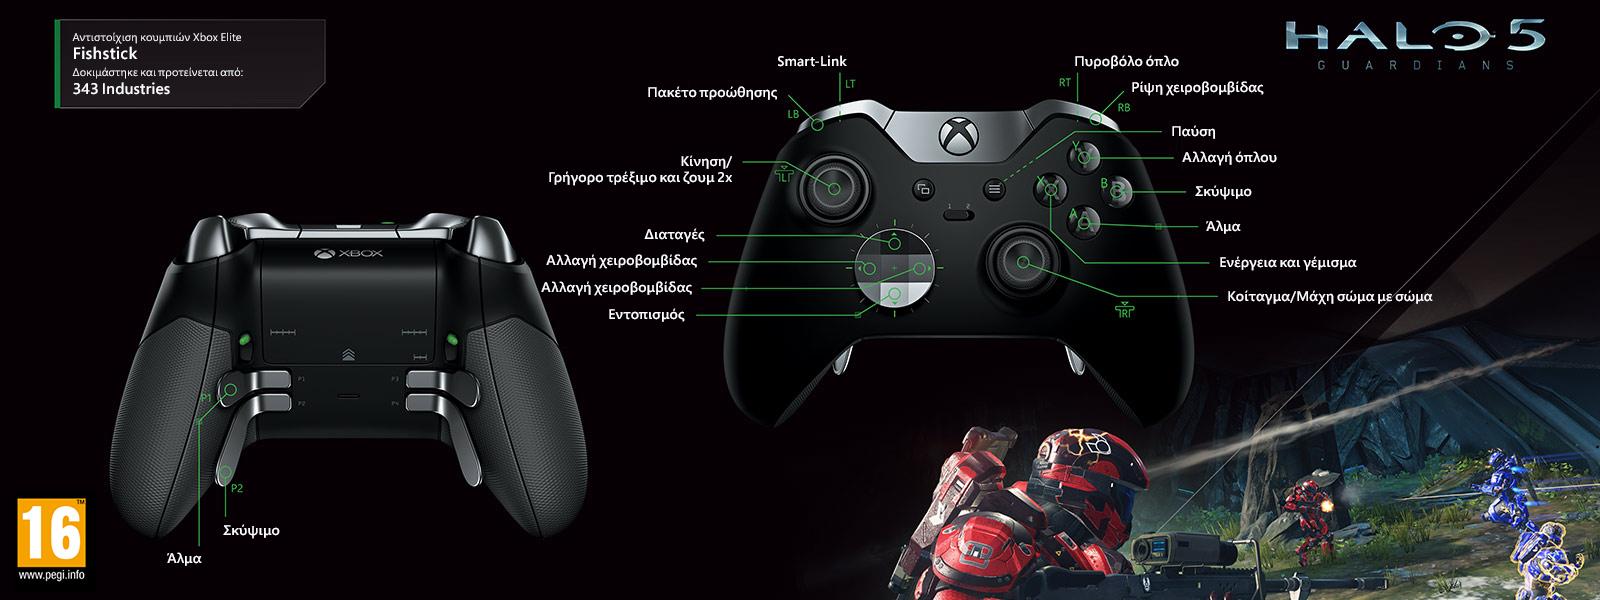 Halo 5 – Χαρτογράφηση Fishstick Elite